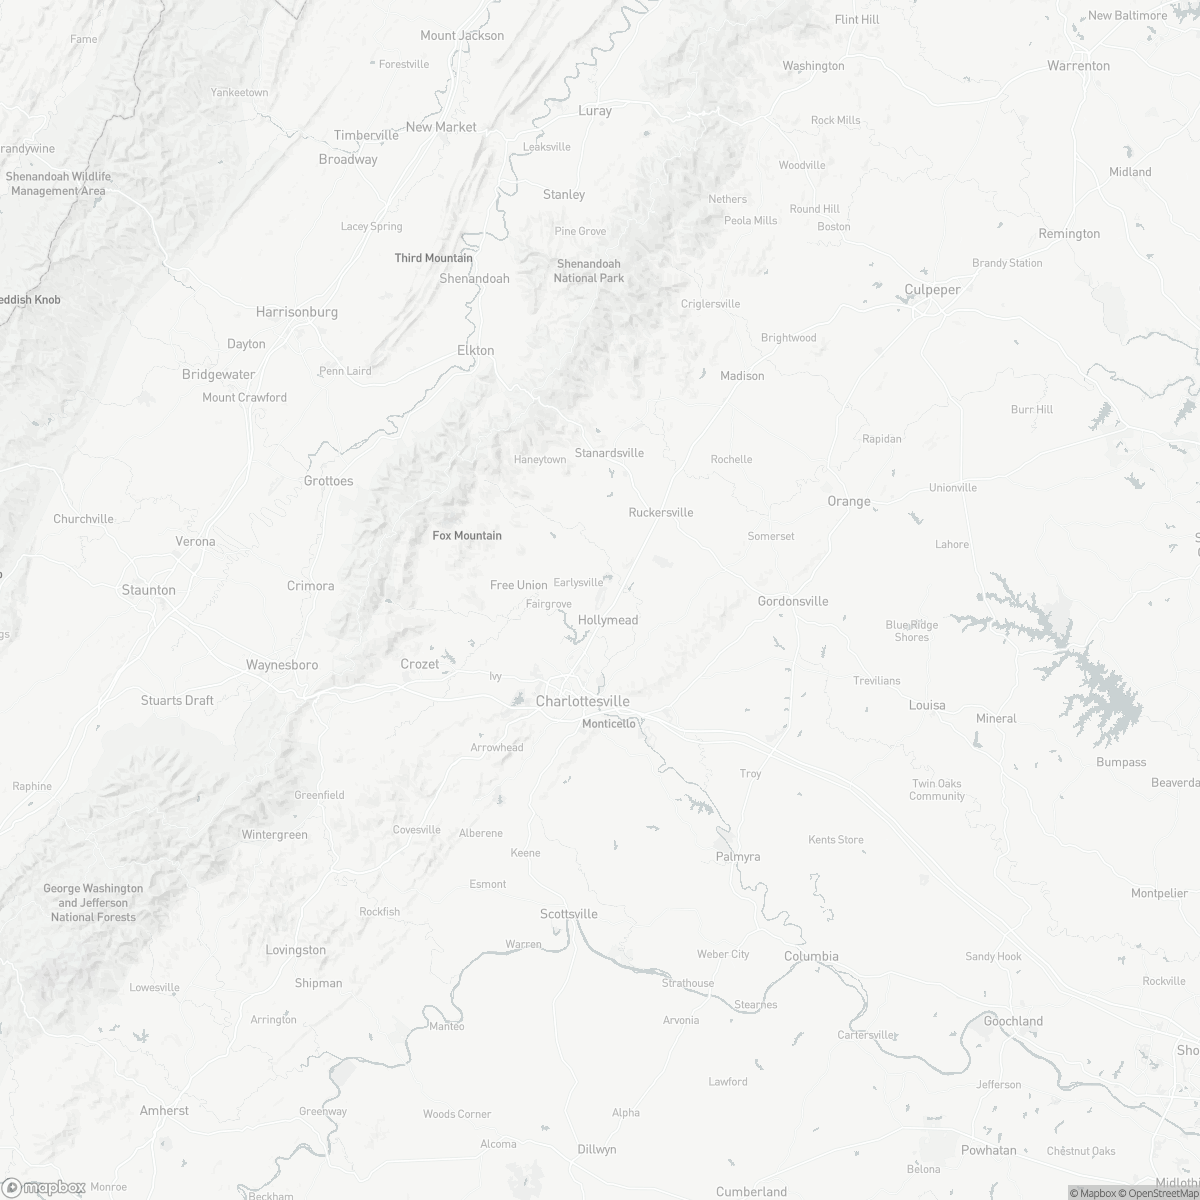 Map of Charlottesville-Albemarle Airport CHO surrounding area of Charlottesville Virginia